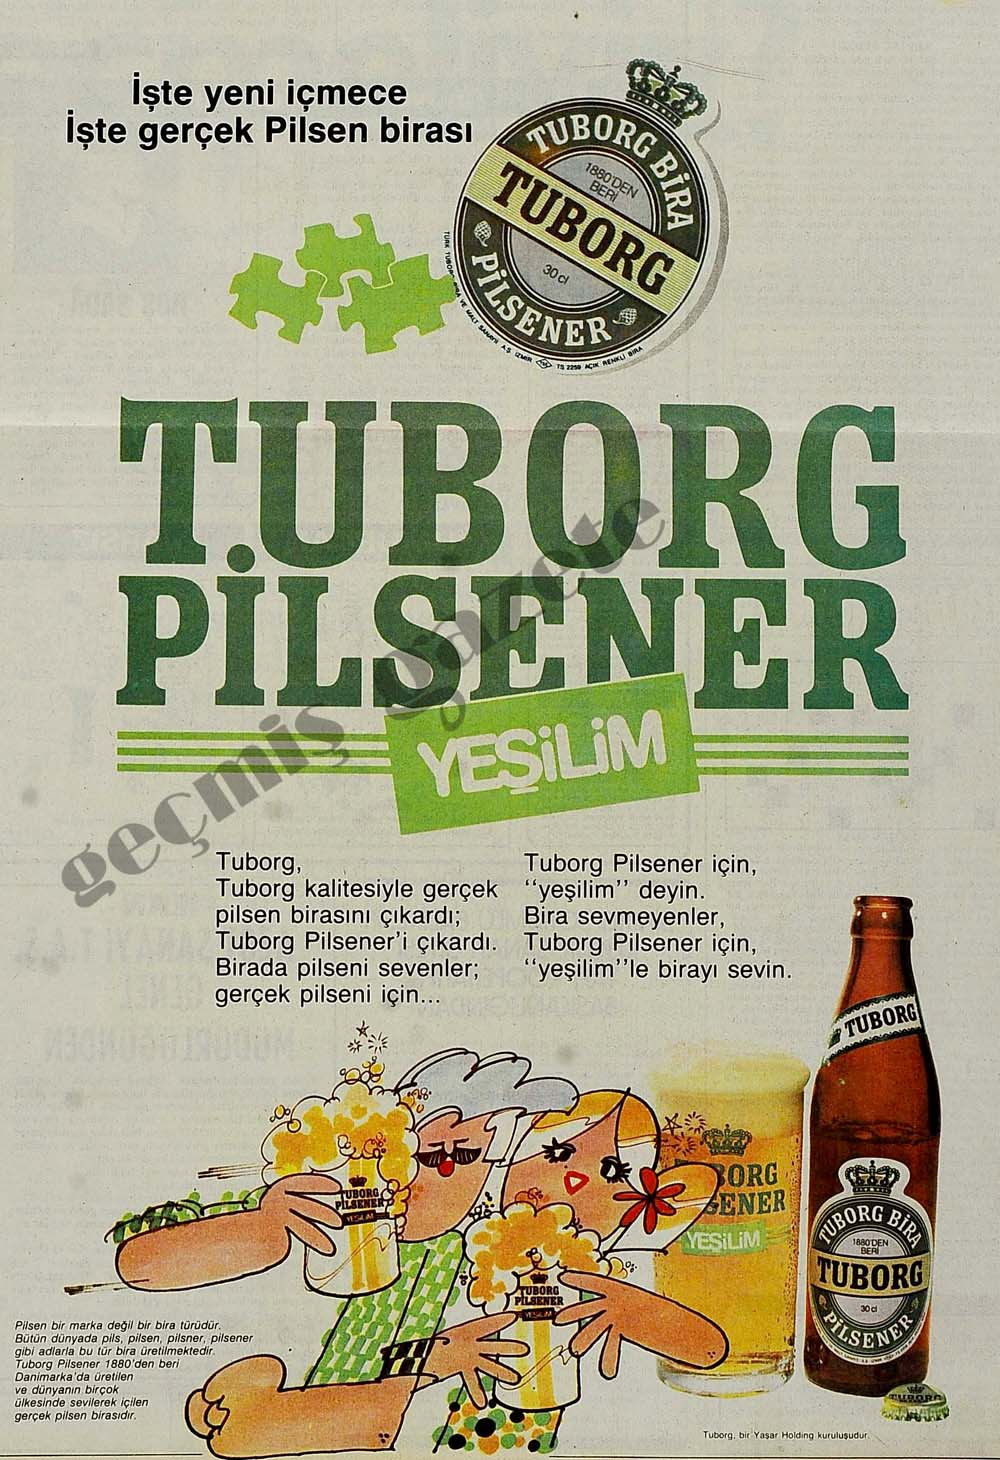 Tuborg Pilsener Yeşilim